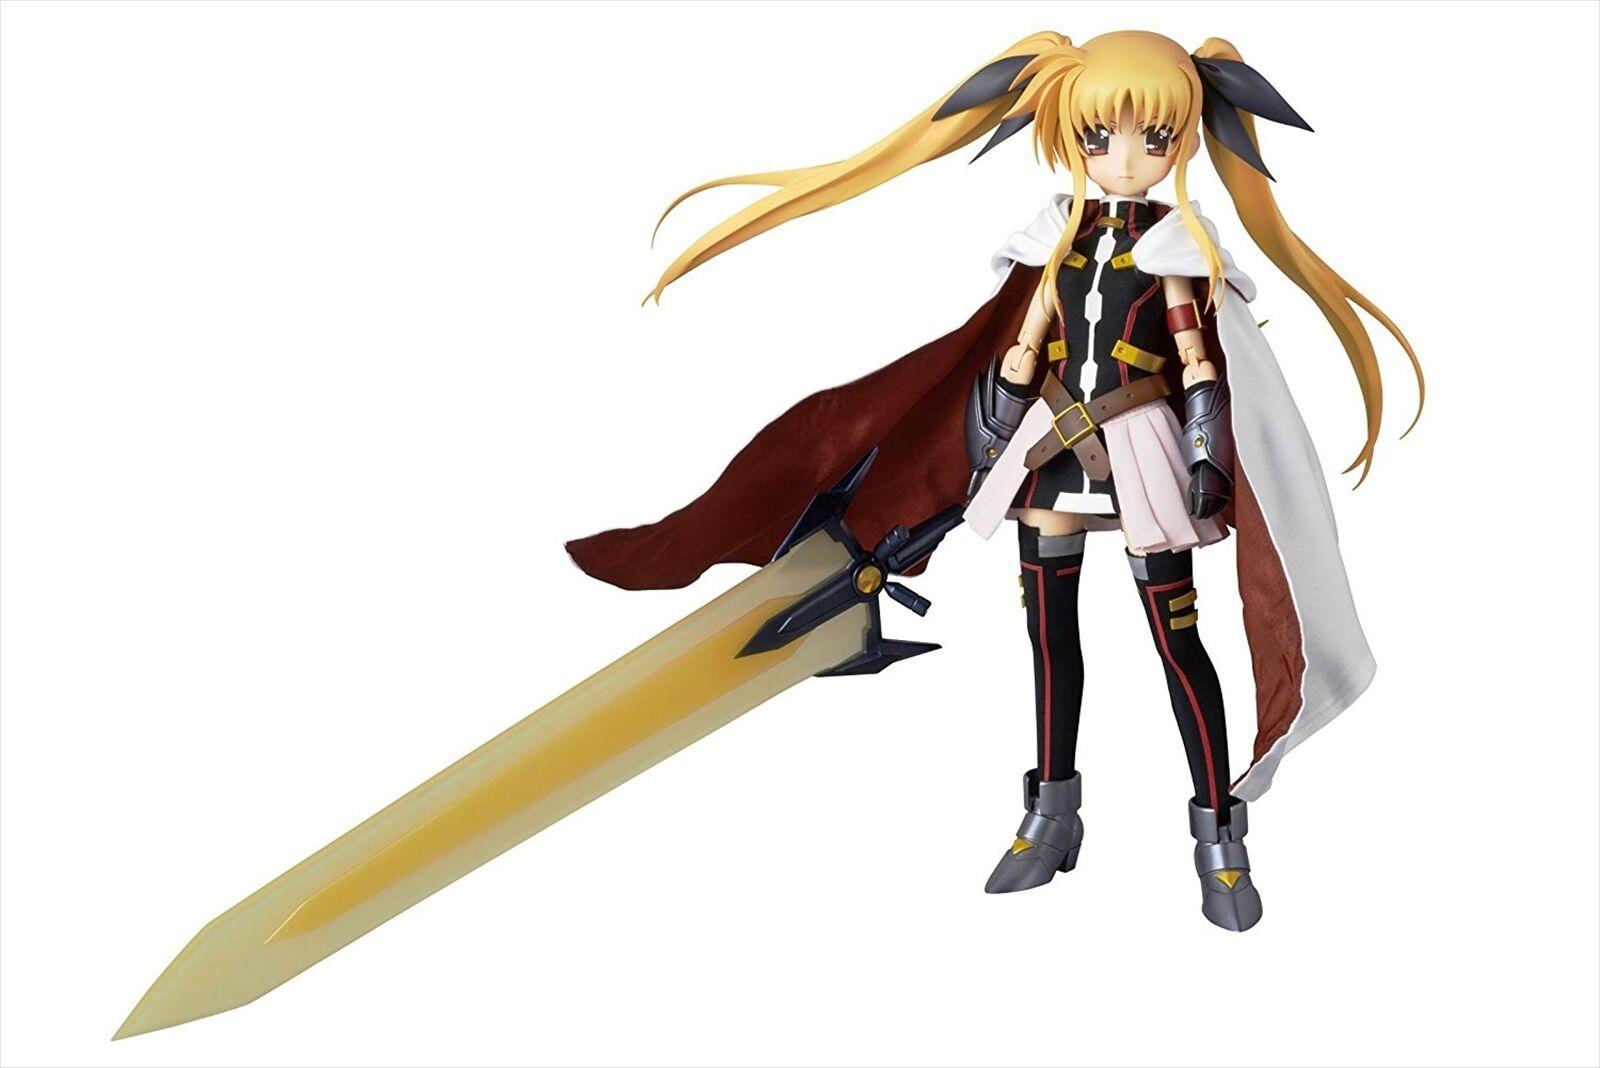 Medicom Real Action Hero Magical Girl Lyrical Lyrical Lyrical Nanoha Fate Testarossa Blaze Form 31b987